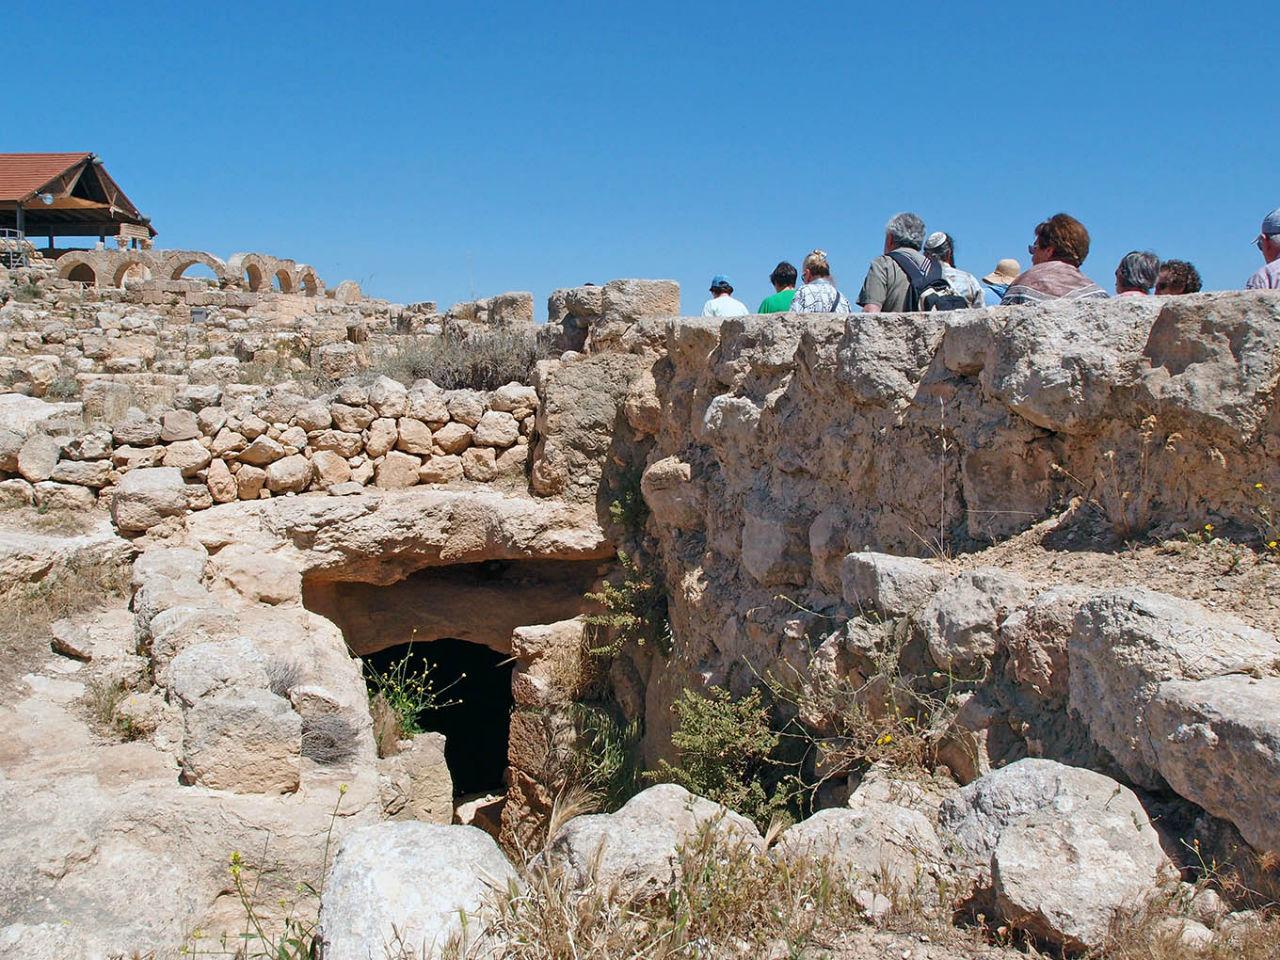 Ботаника, археология и зеленая черта Сусия, Палестина